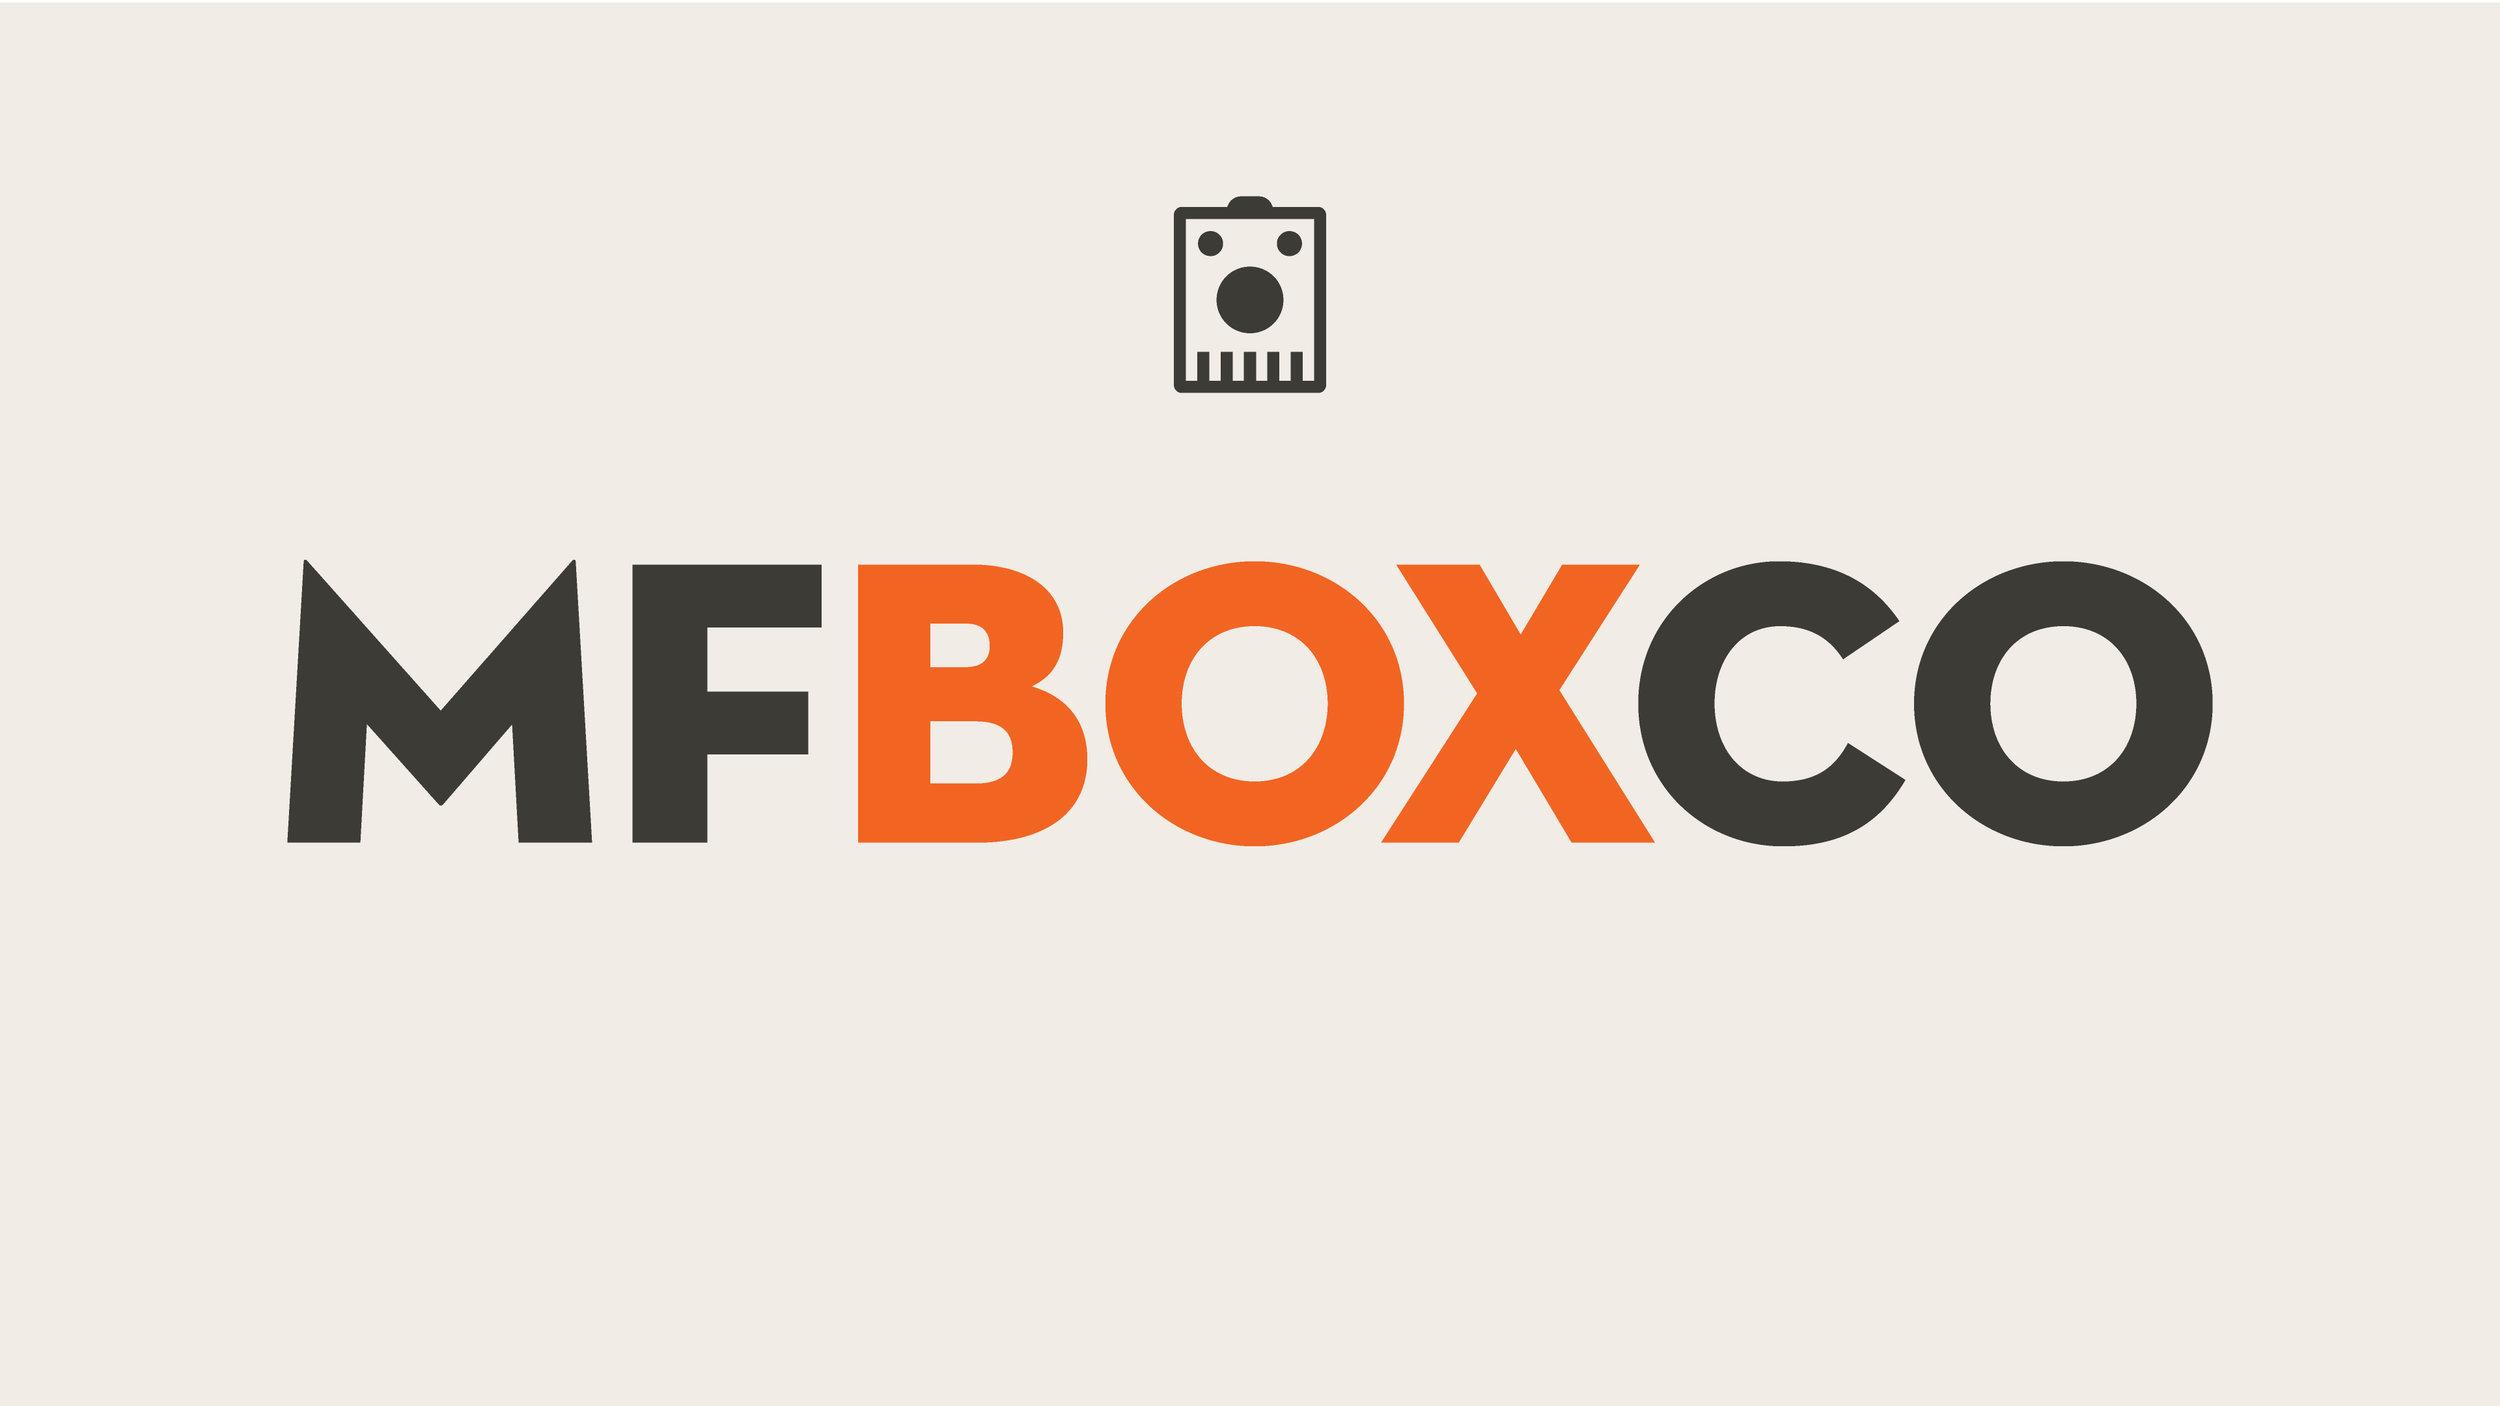 MFBOXCO-4Klogo.jpg